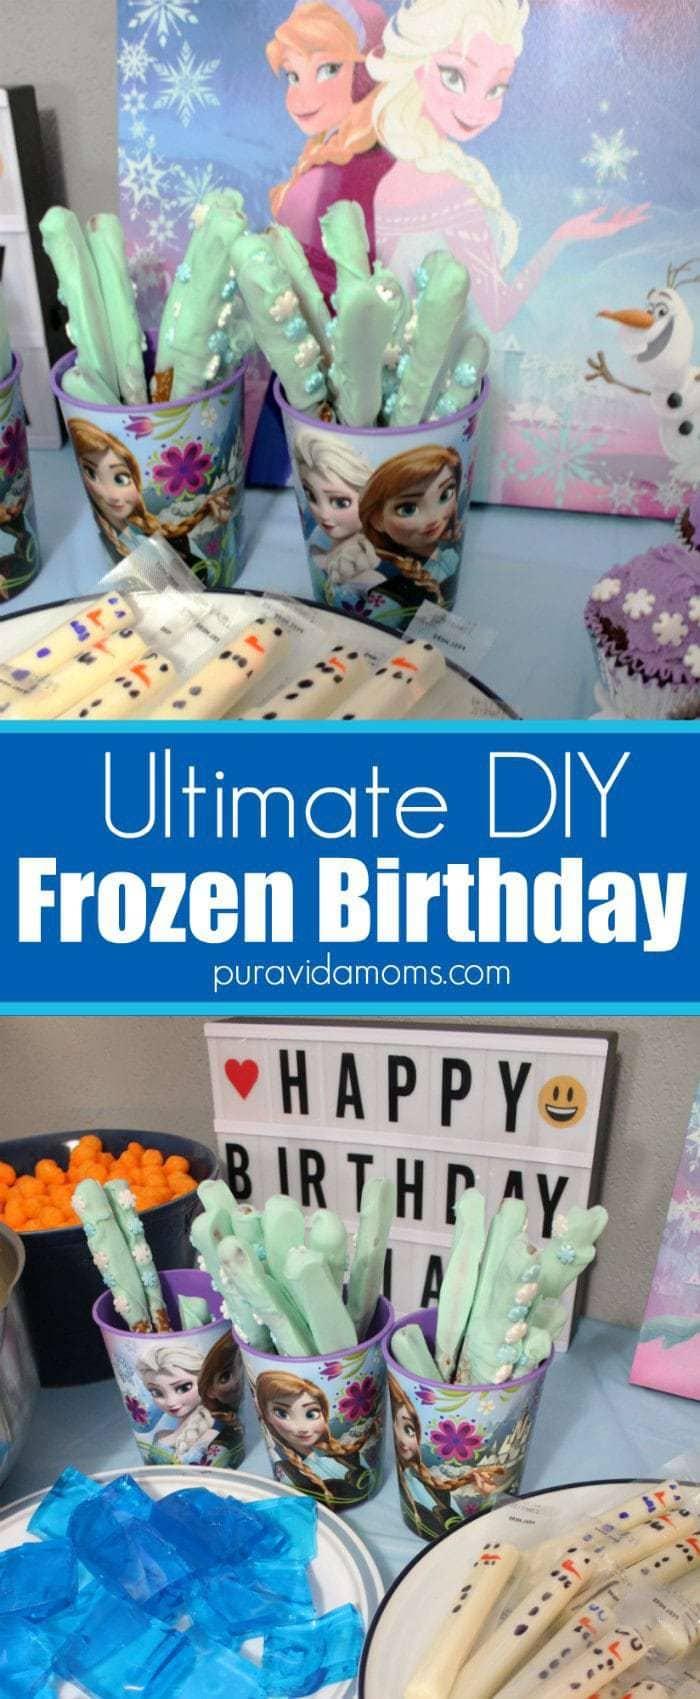 Ultimate DIY Frozen Birthday Party